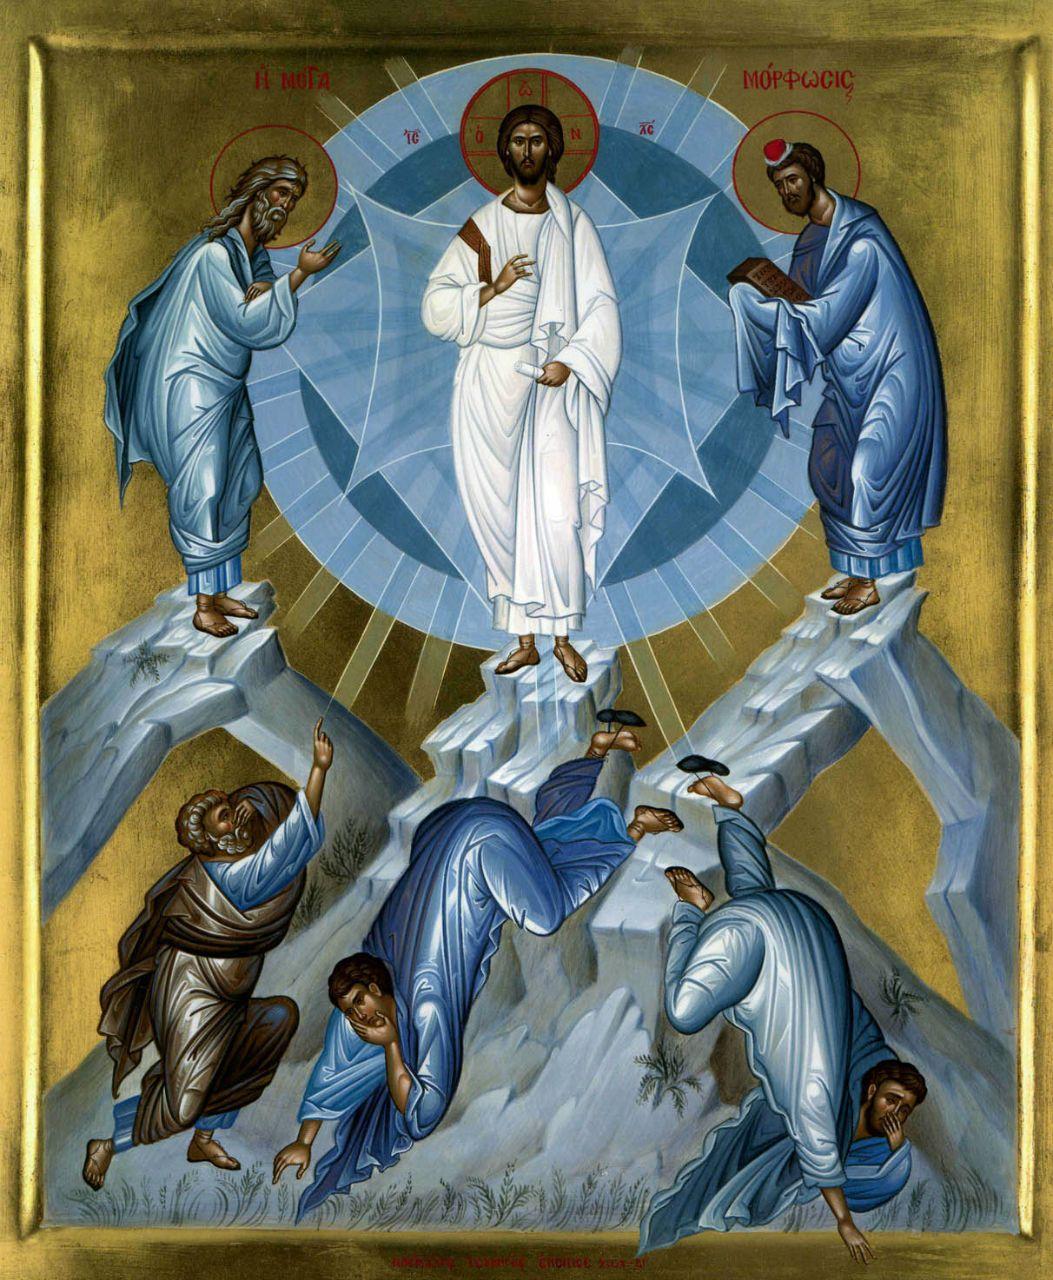 Transfiguration of Christ / Μεταμόρφωση του Σωτήρος | Иисус...